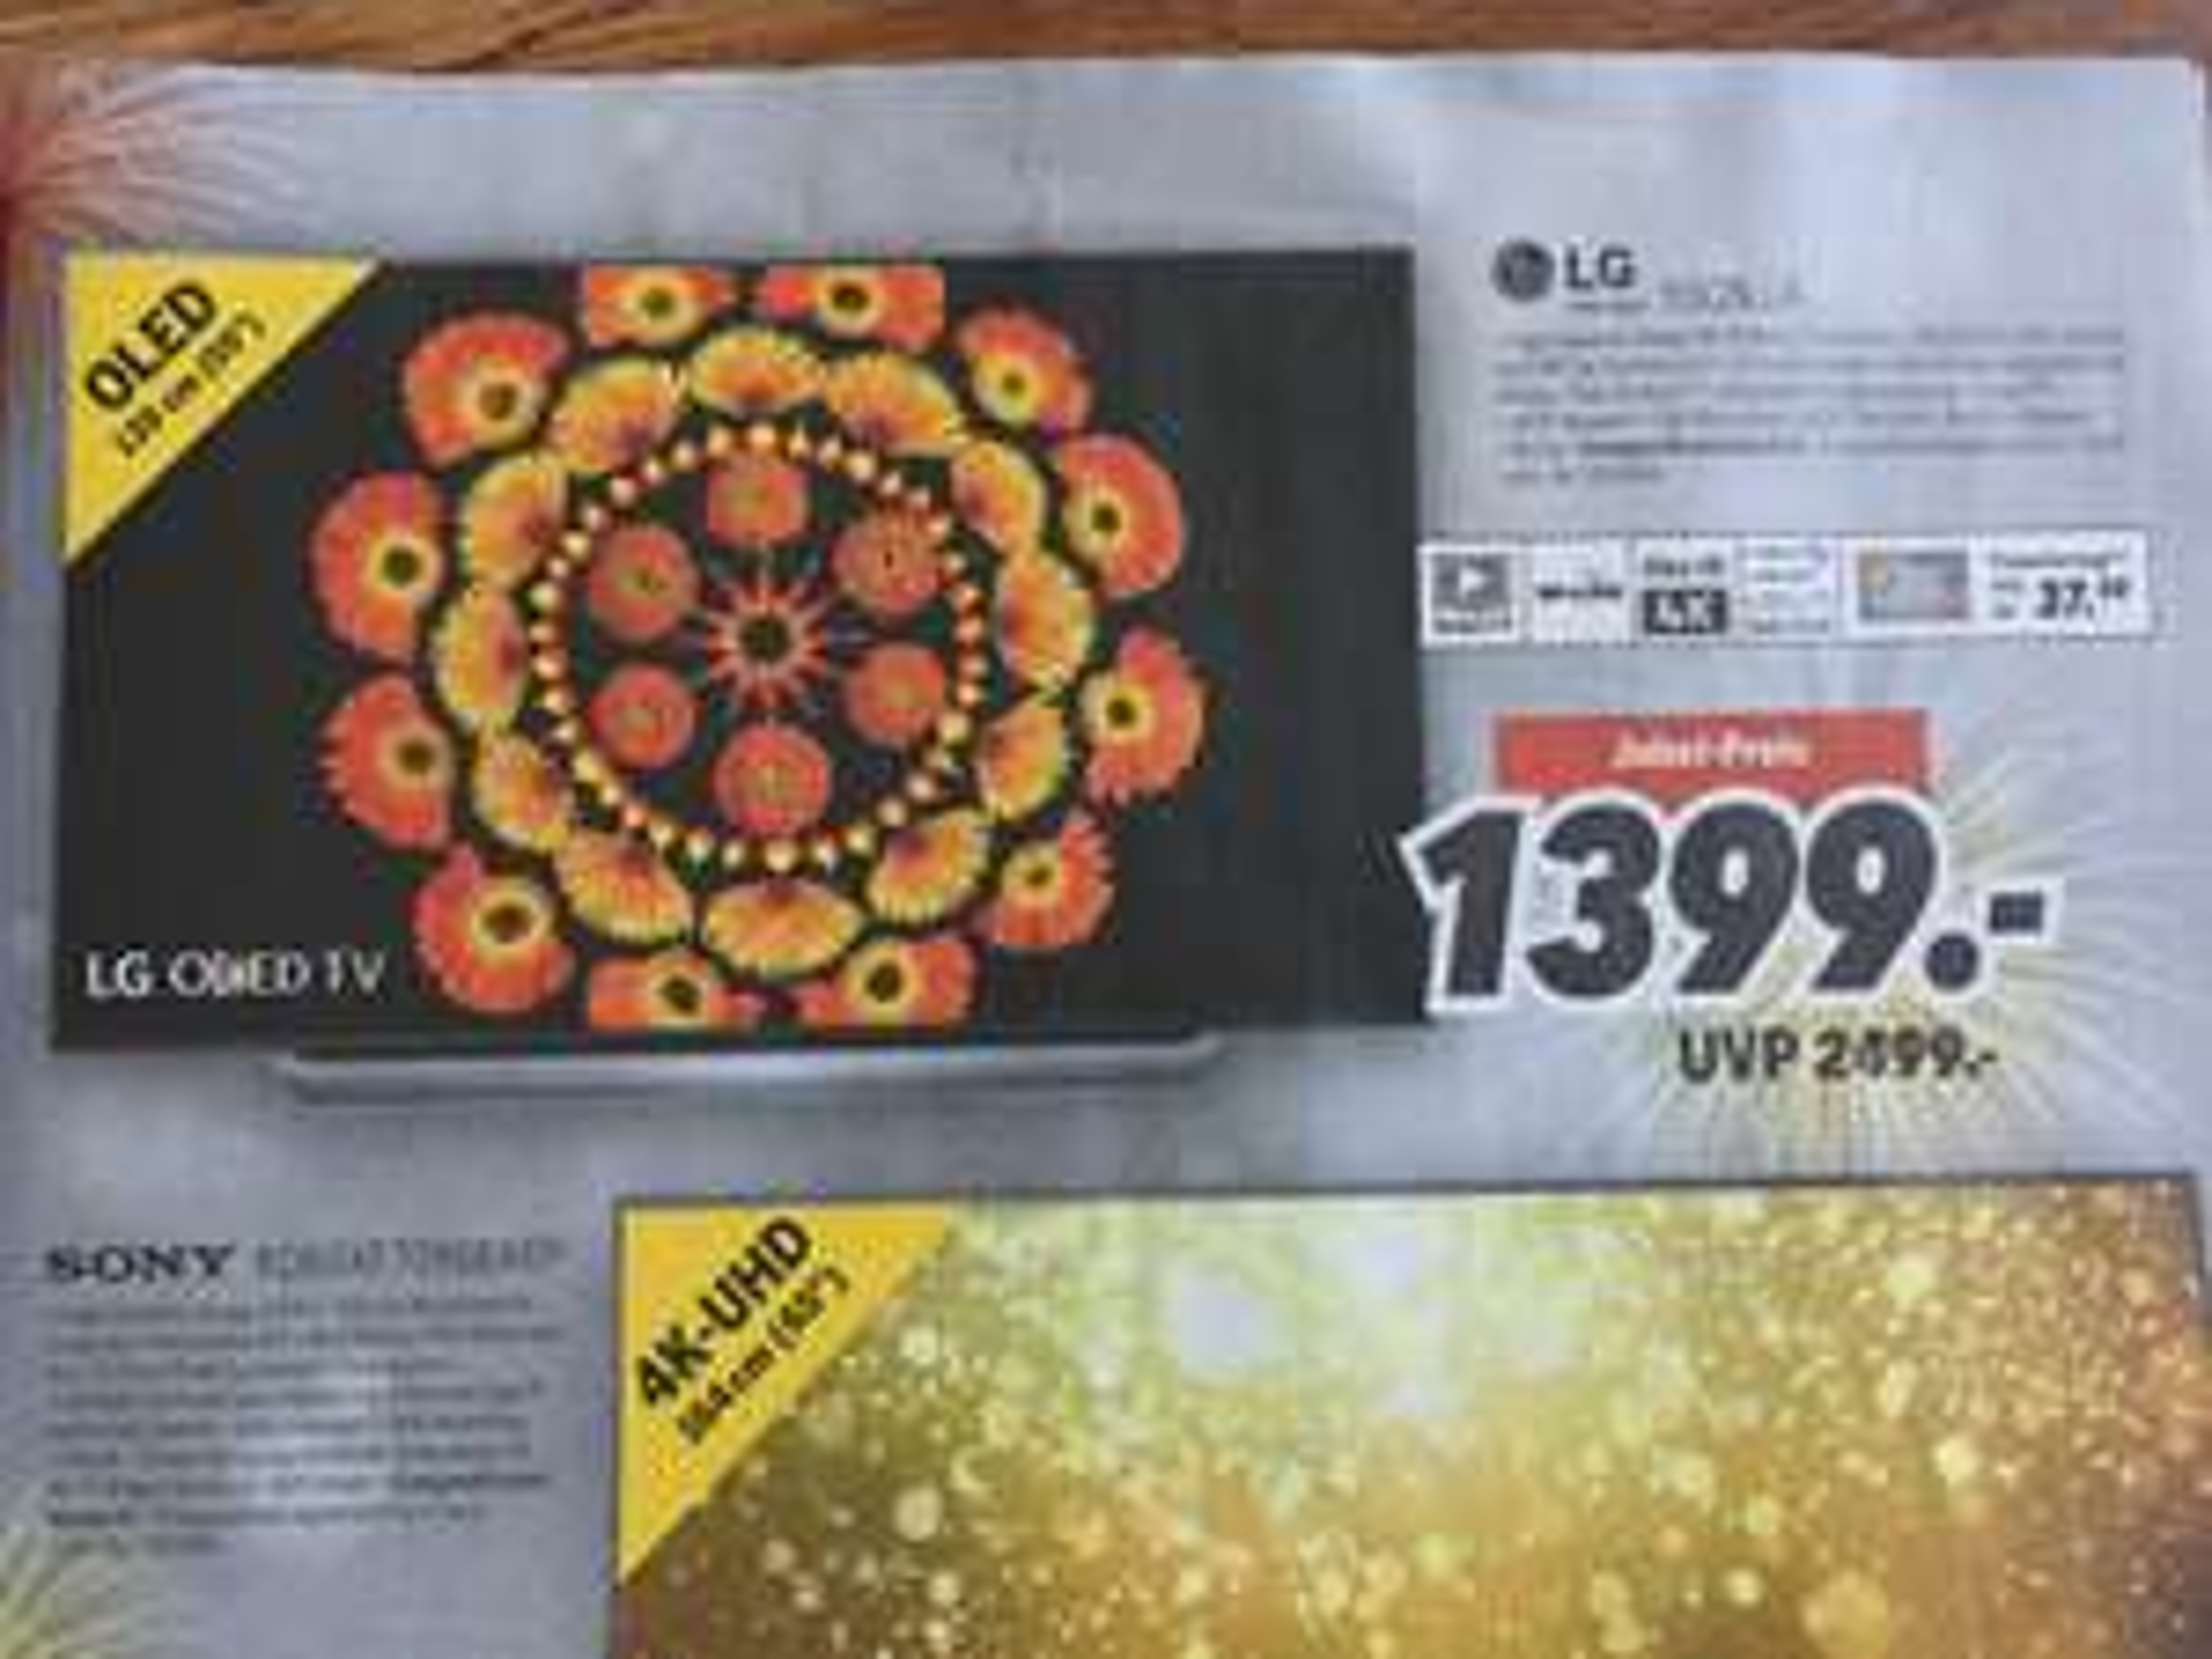 "[Lokal Medimax Andernach] LG OLED 55C8 55C8LLA 55"" 4K HDR TV Fernseher"